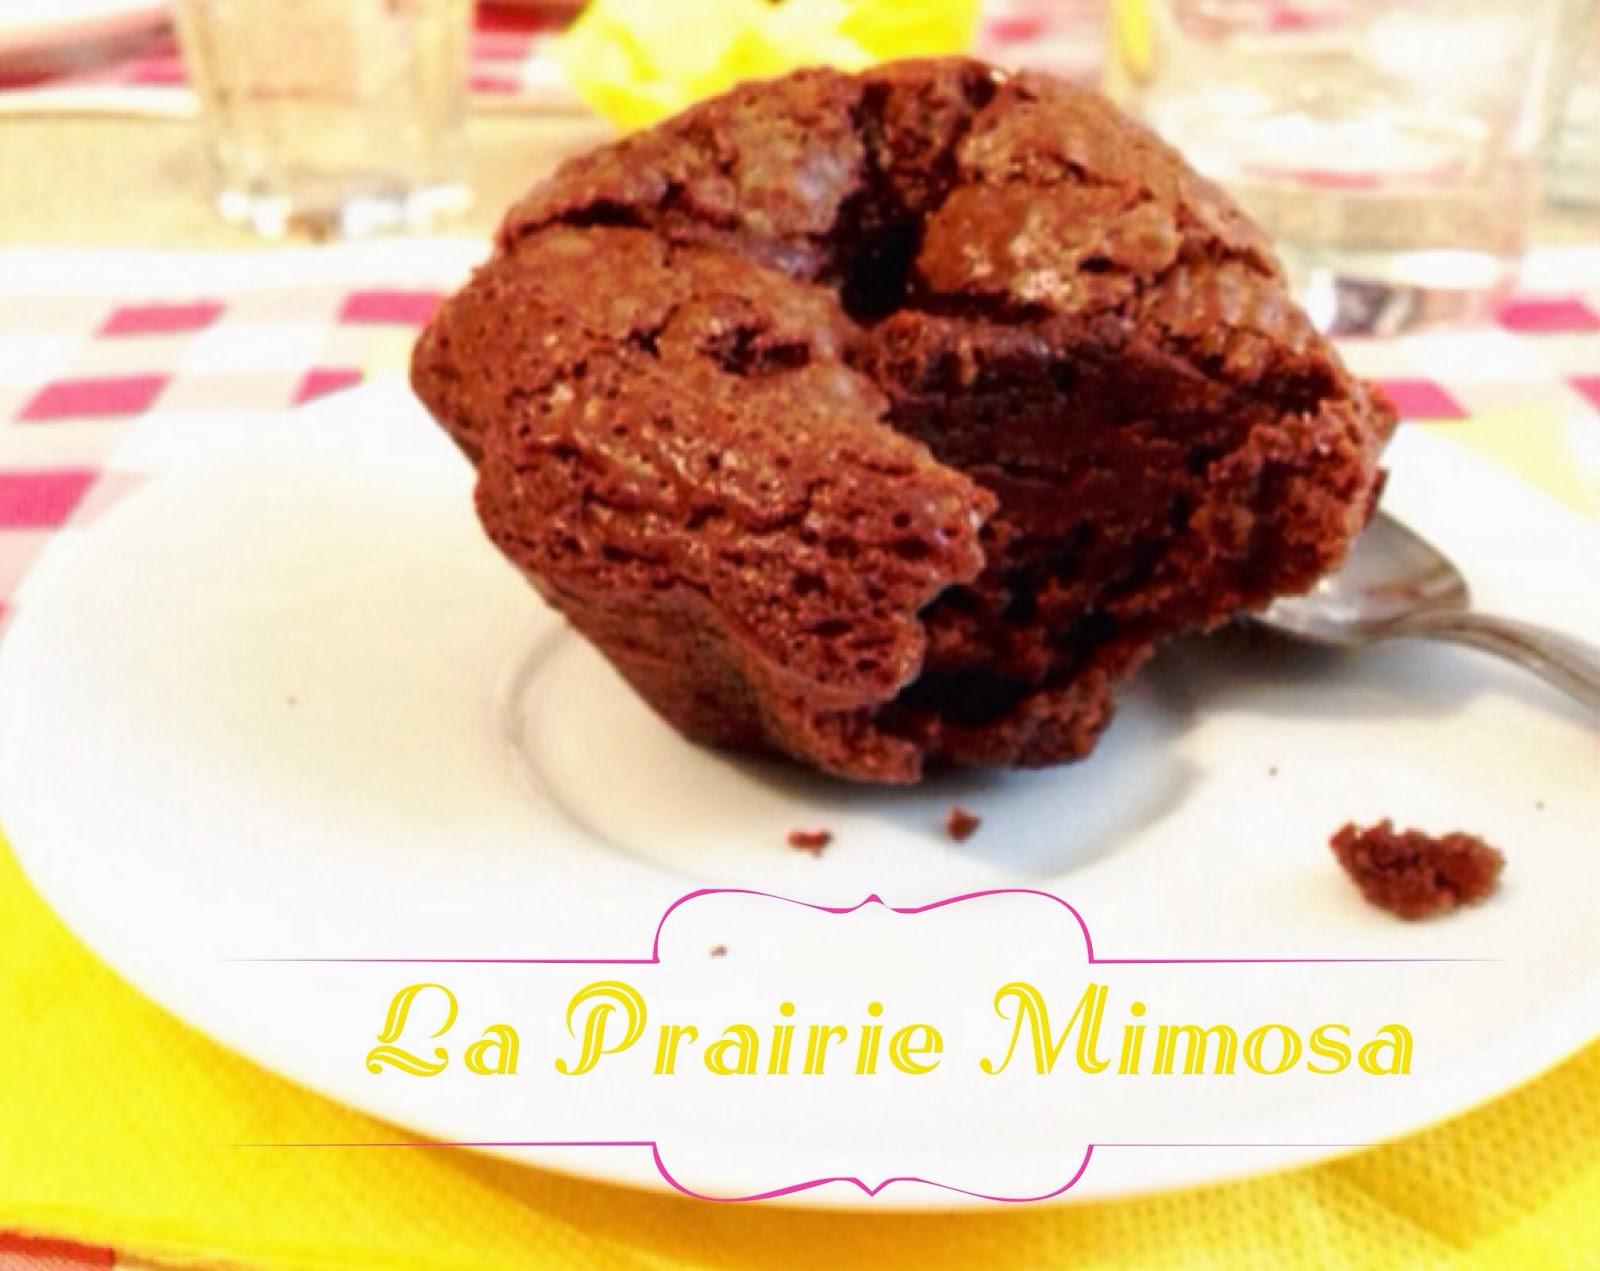 Prairie Mimosa Miam Home Made Resto Fait Maison Montpellier